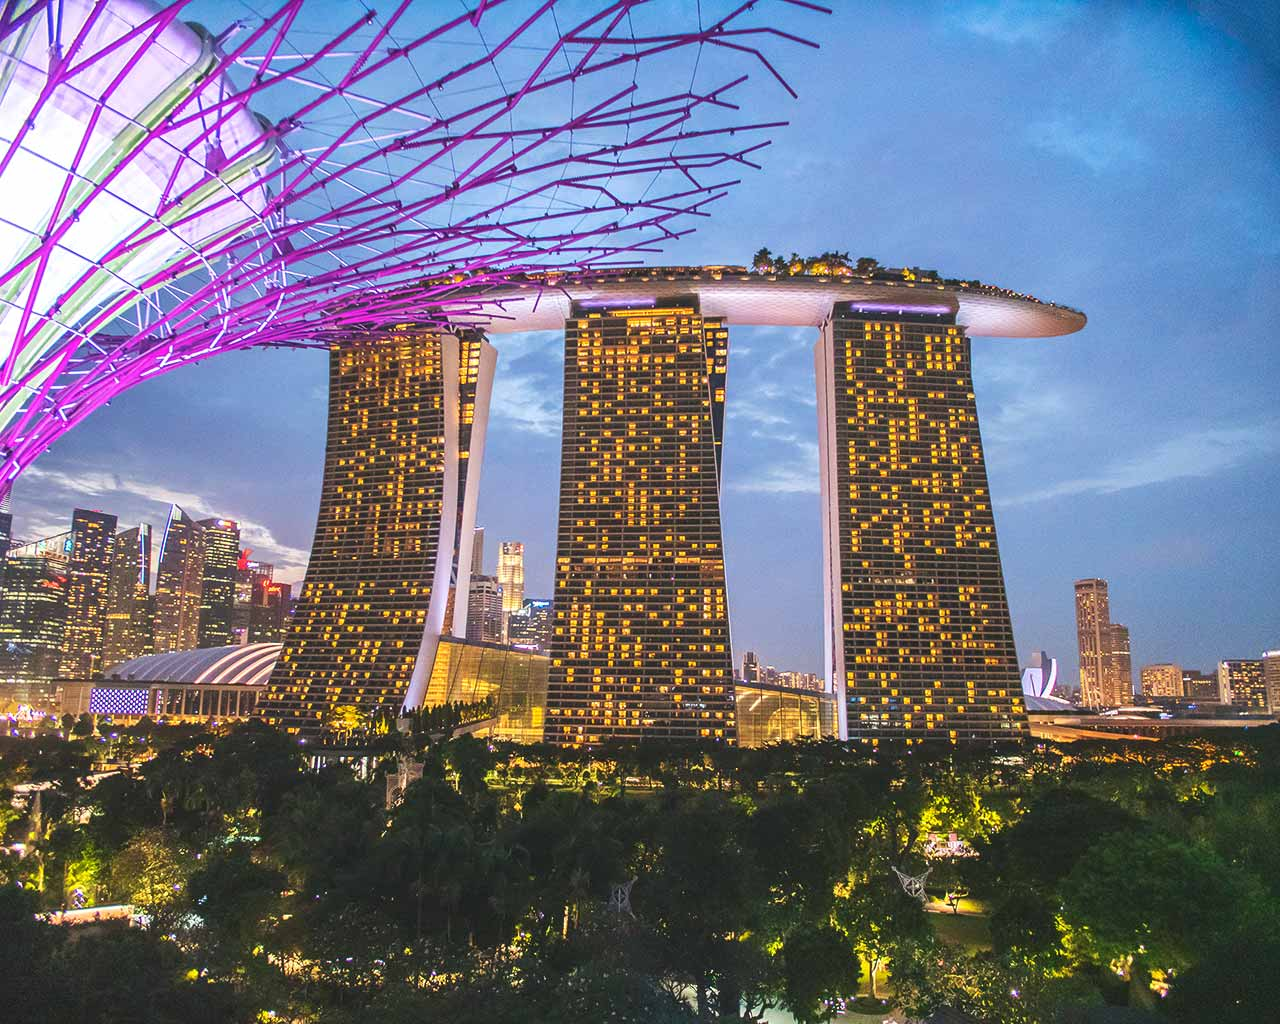 Marina Bay Sands Hotel - fotografiert vom Supertree